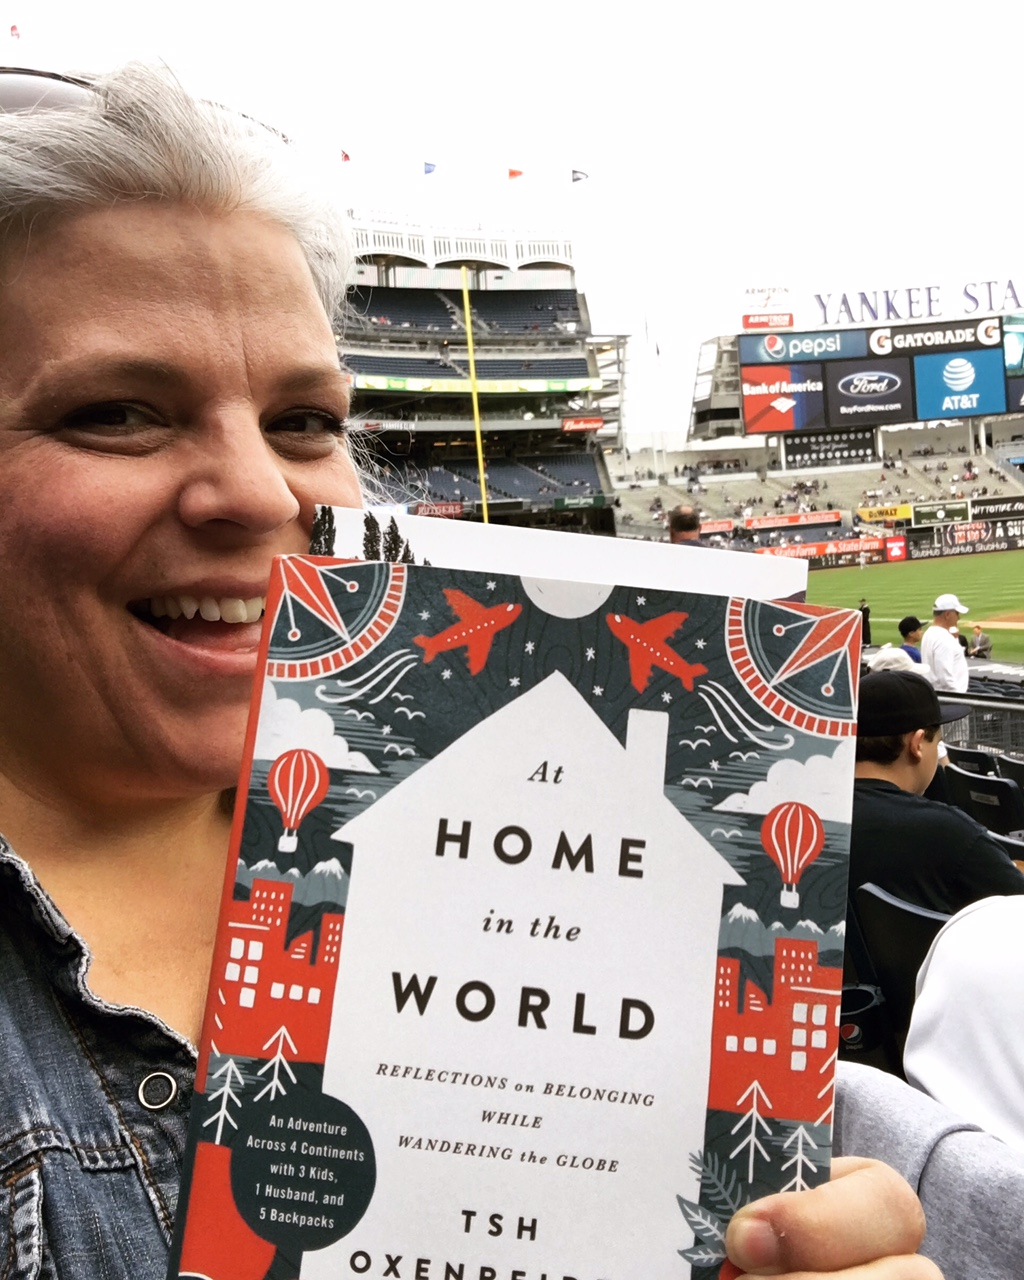 Reading at Yankee stadium